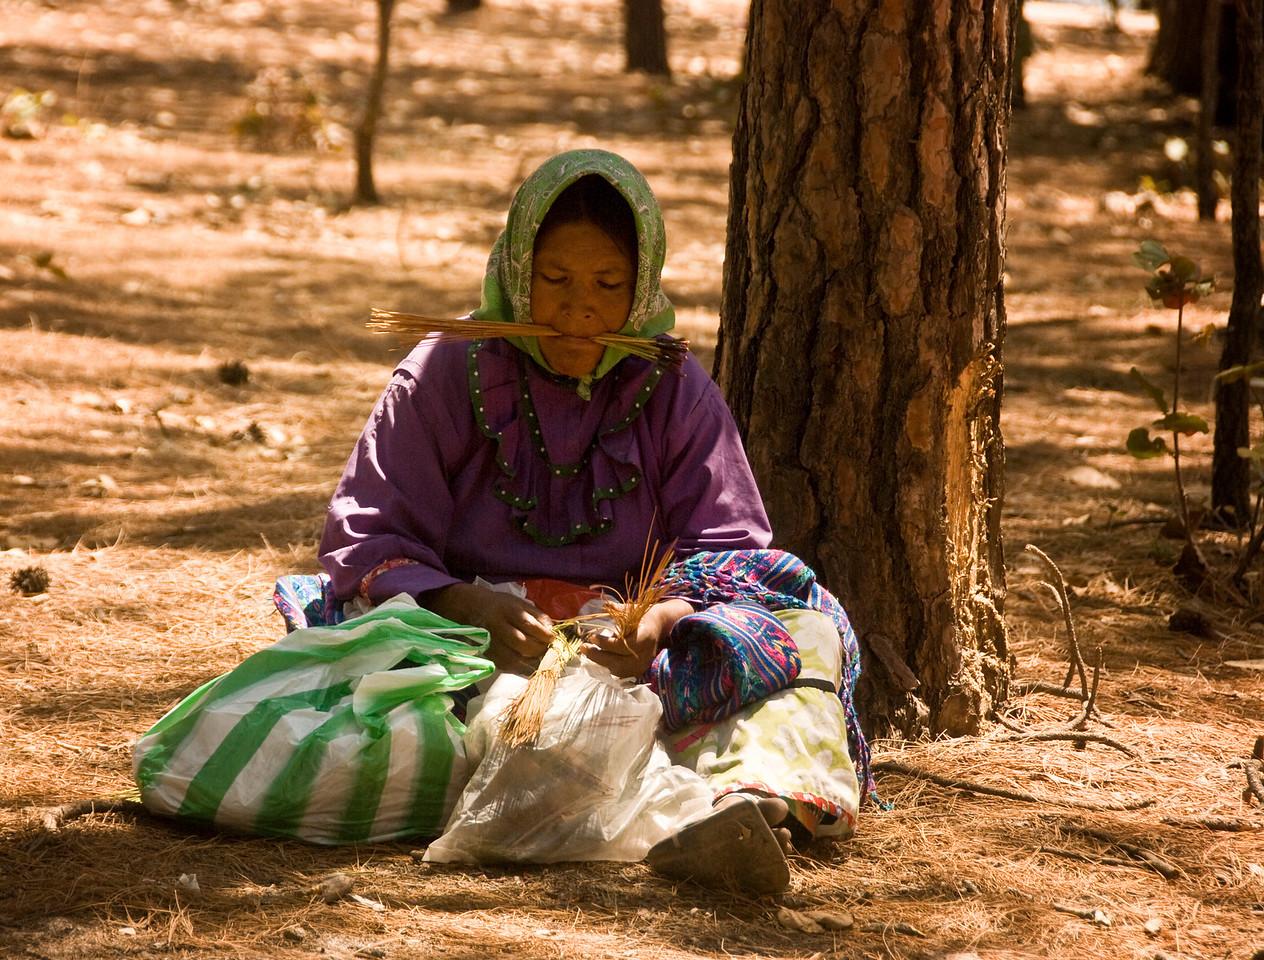 Tarahumara Indian woman weaving basket